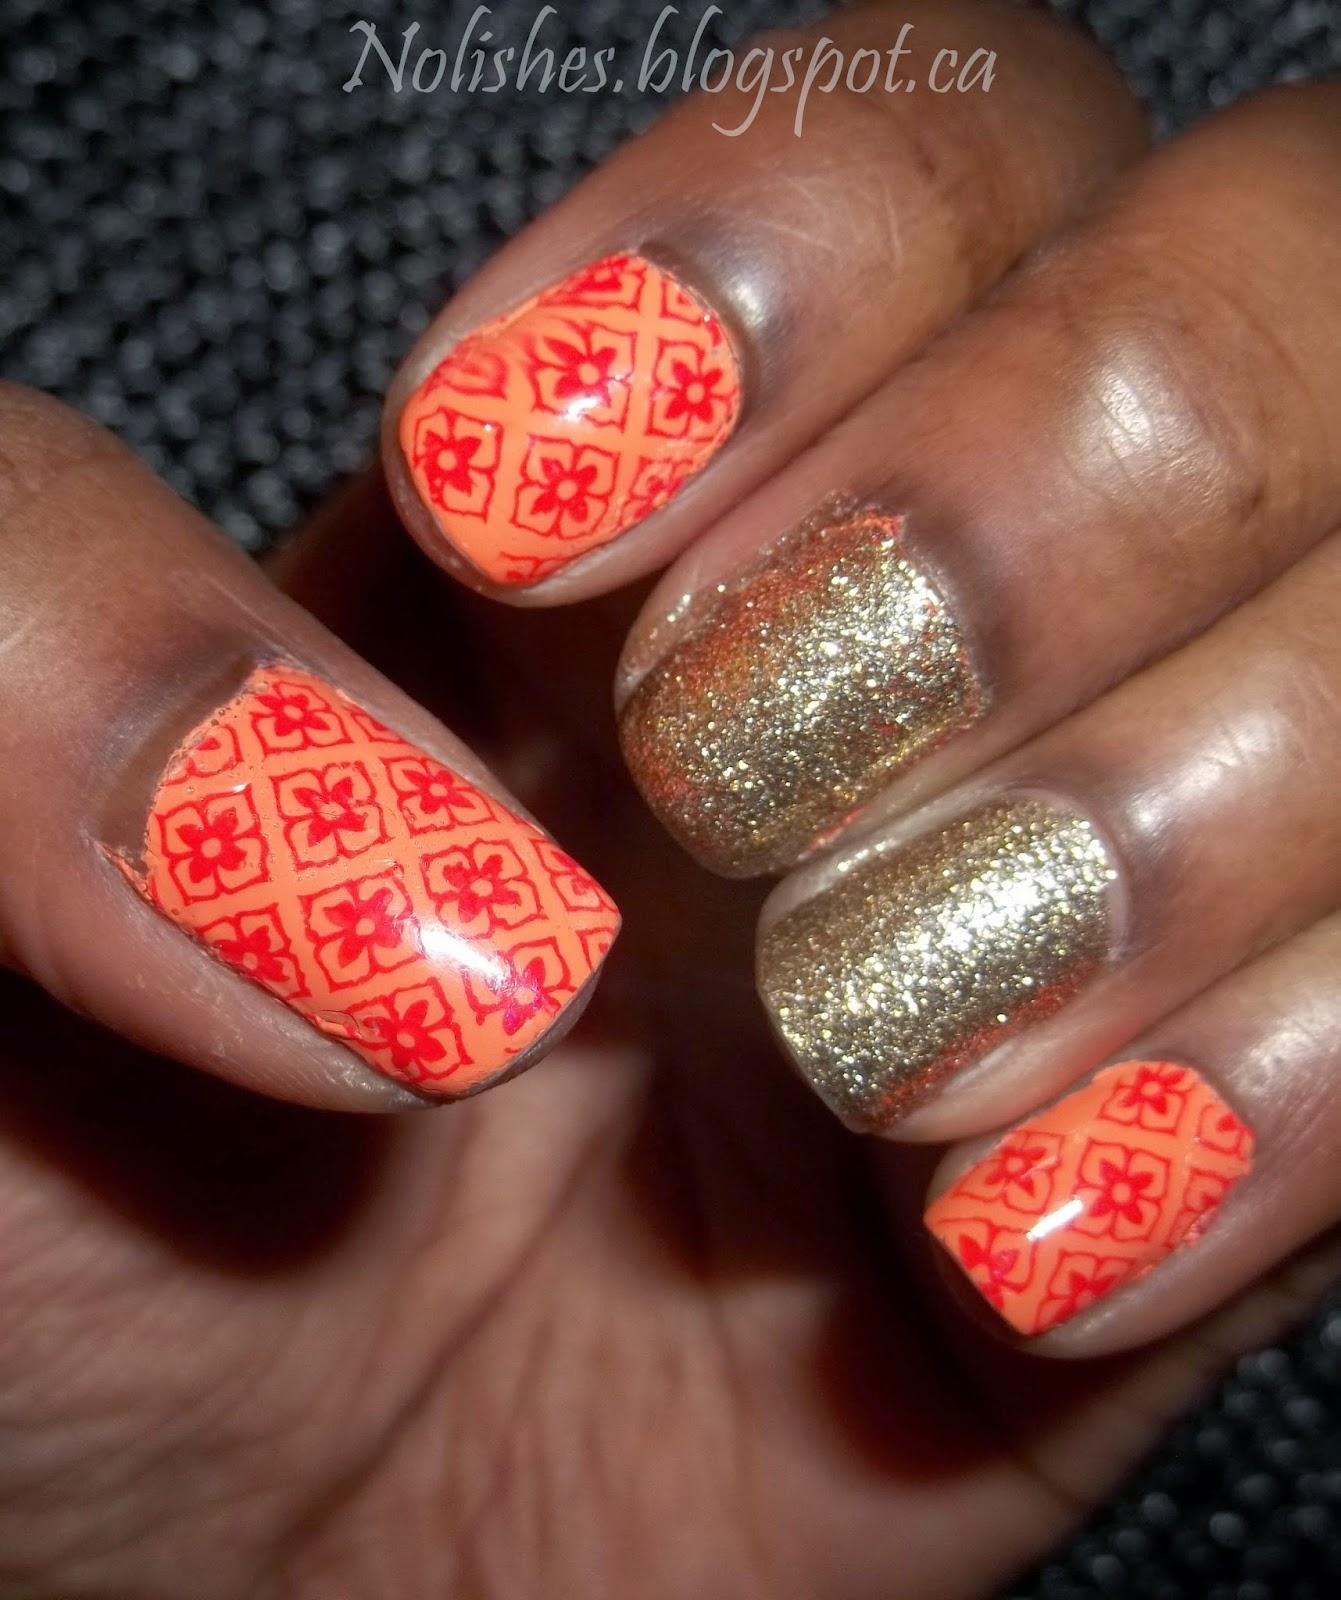 Orange gold nail art : Orange and gold nail stamping manicure using moyou london artist